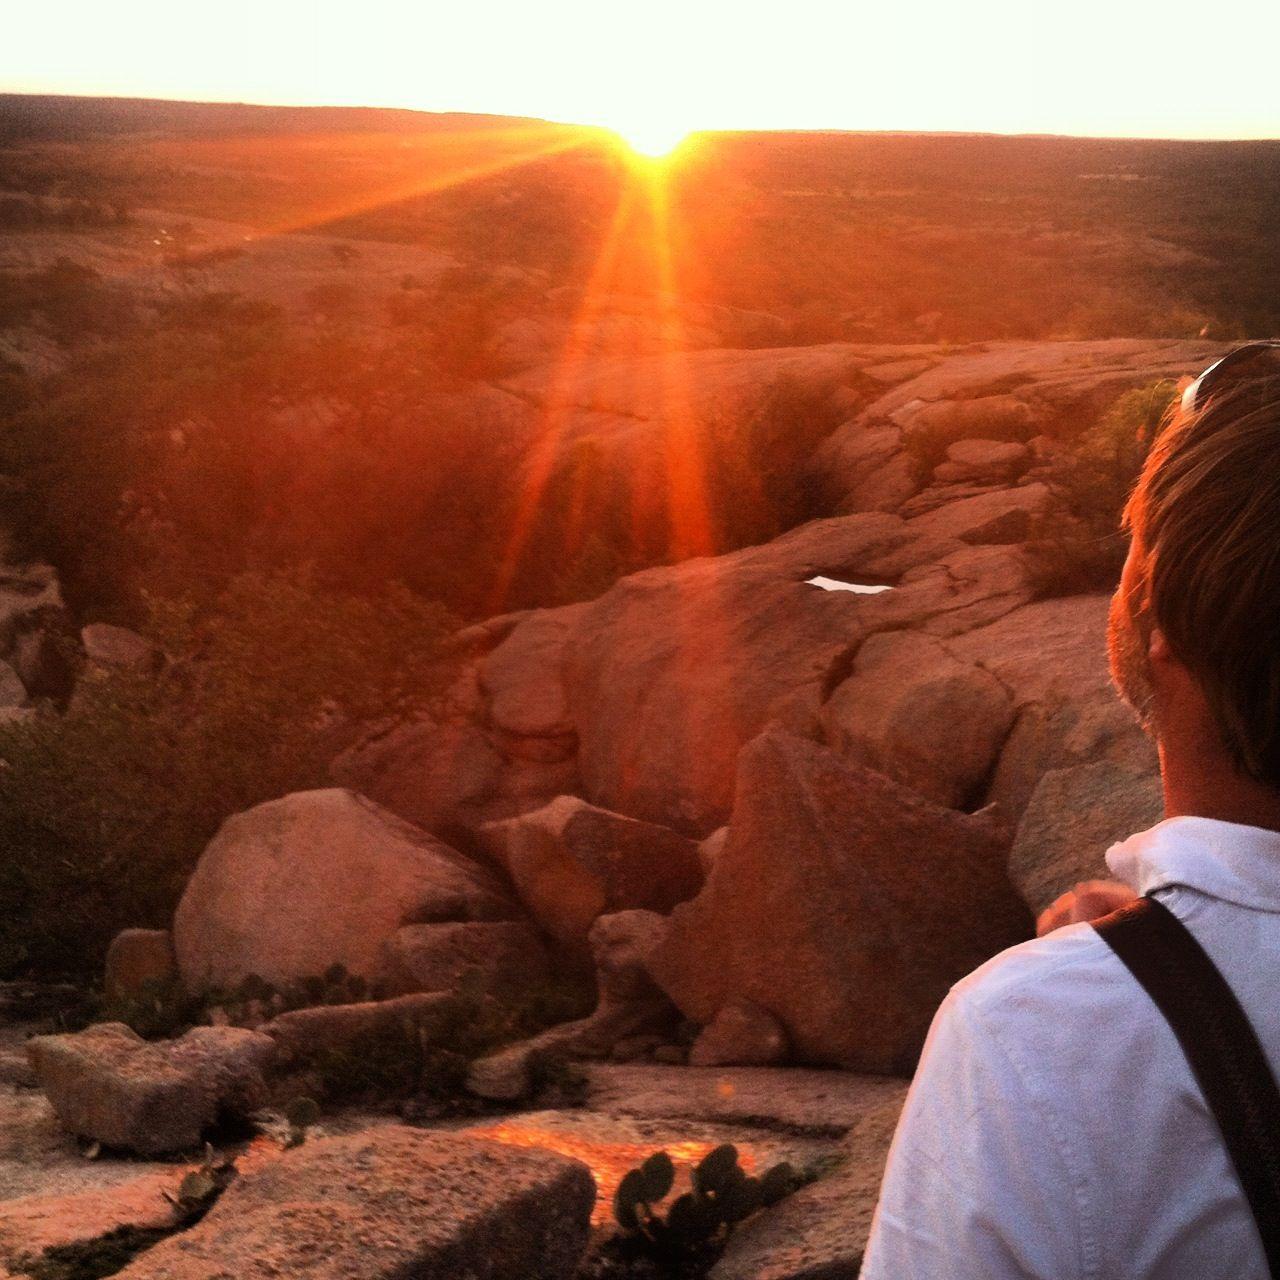 Enchanted Rock State Natural Area in Fredericksburg, TX ...